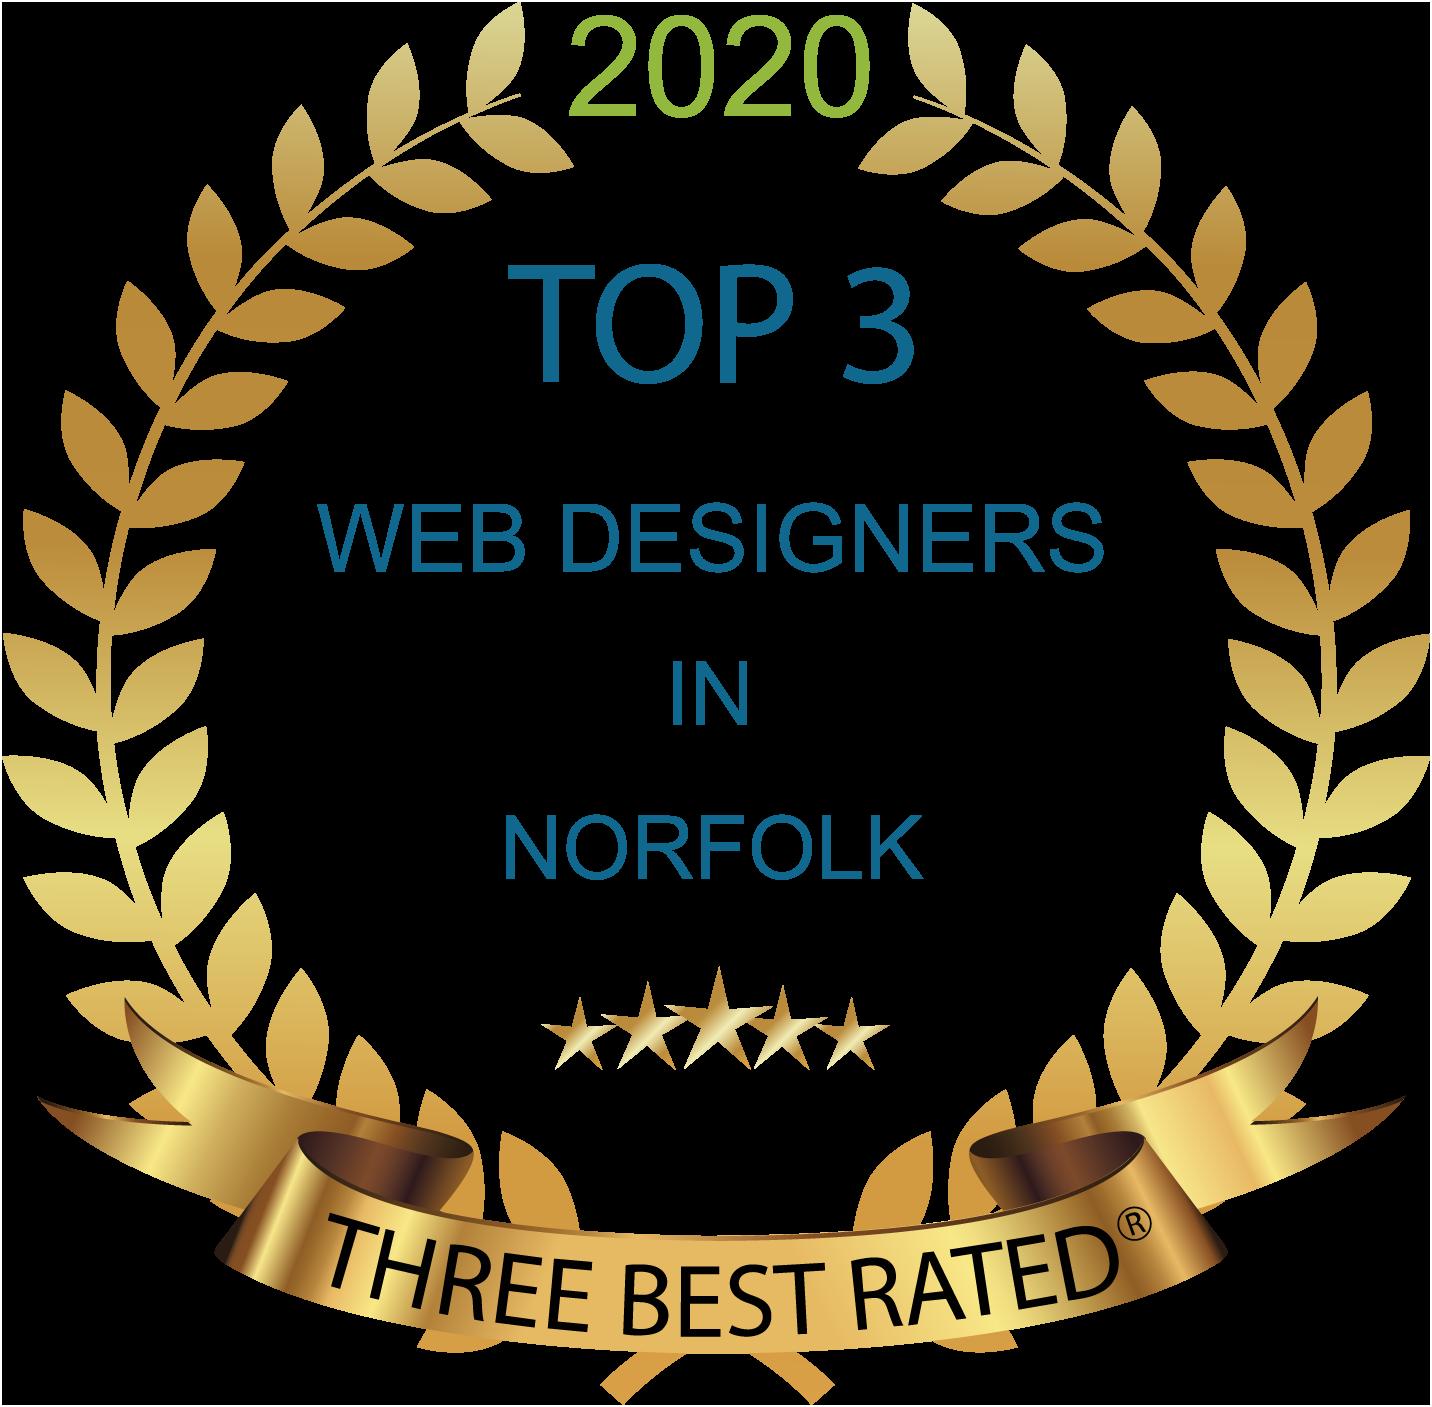 Three Best Rated - Norfolk Web Design - Web Development - Award Winning Web Design